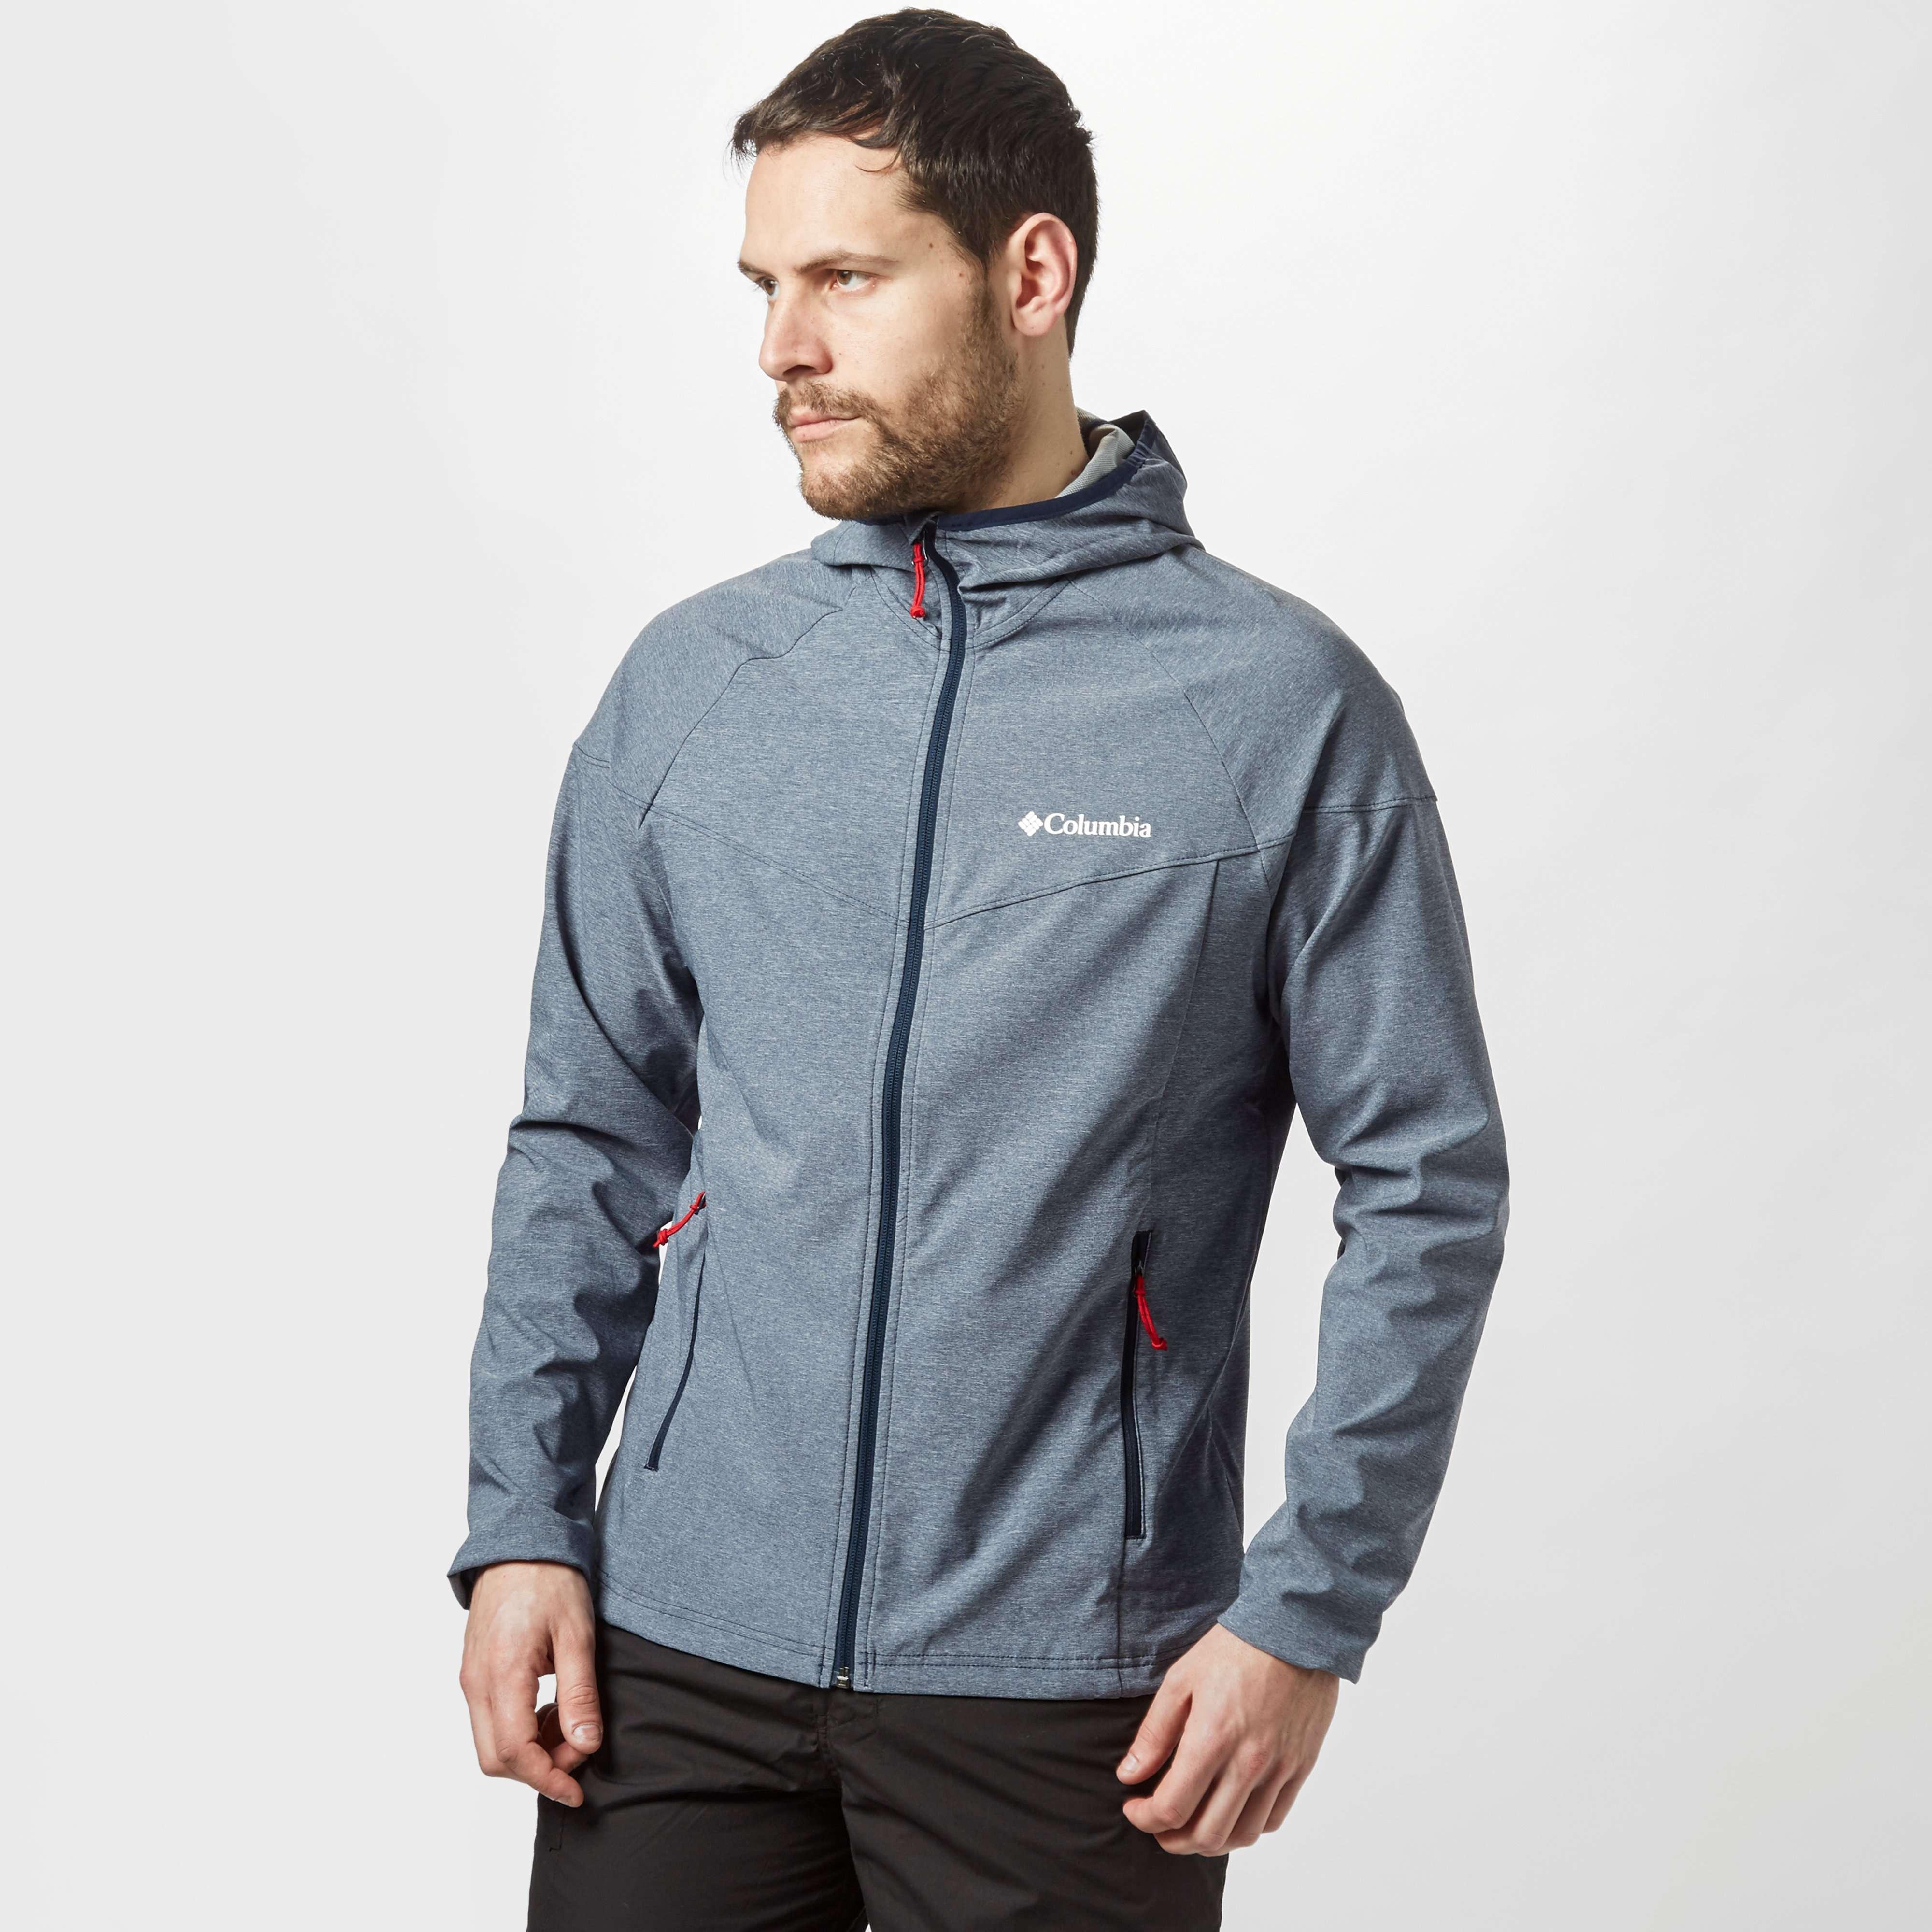 COLUMBIA Men's Canyon™ Softshell Jacket